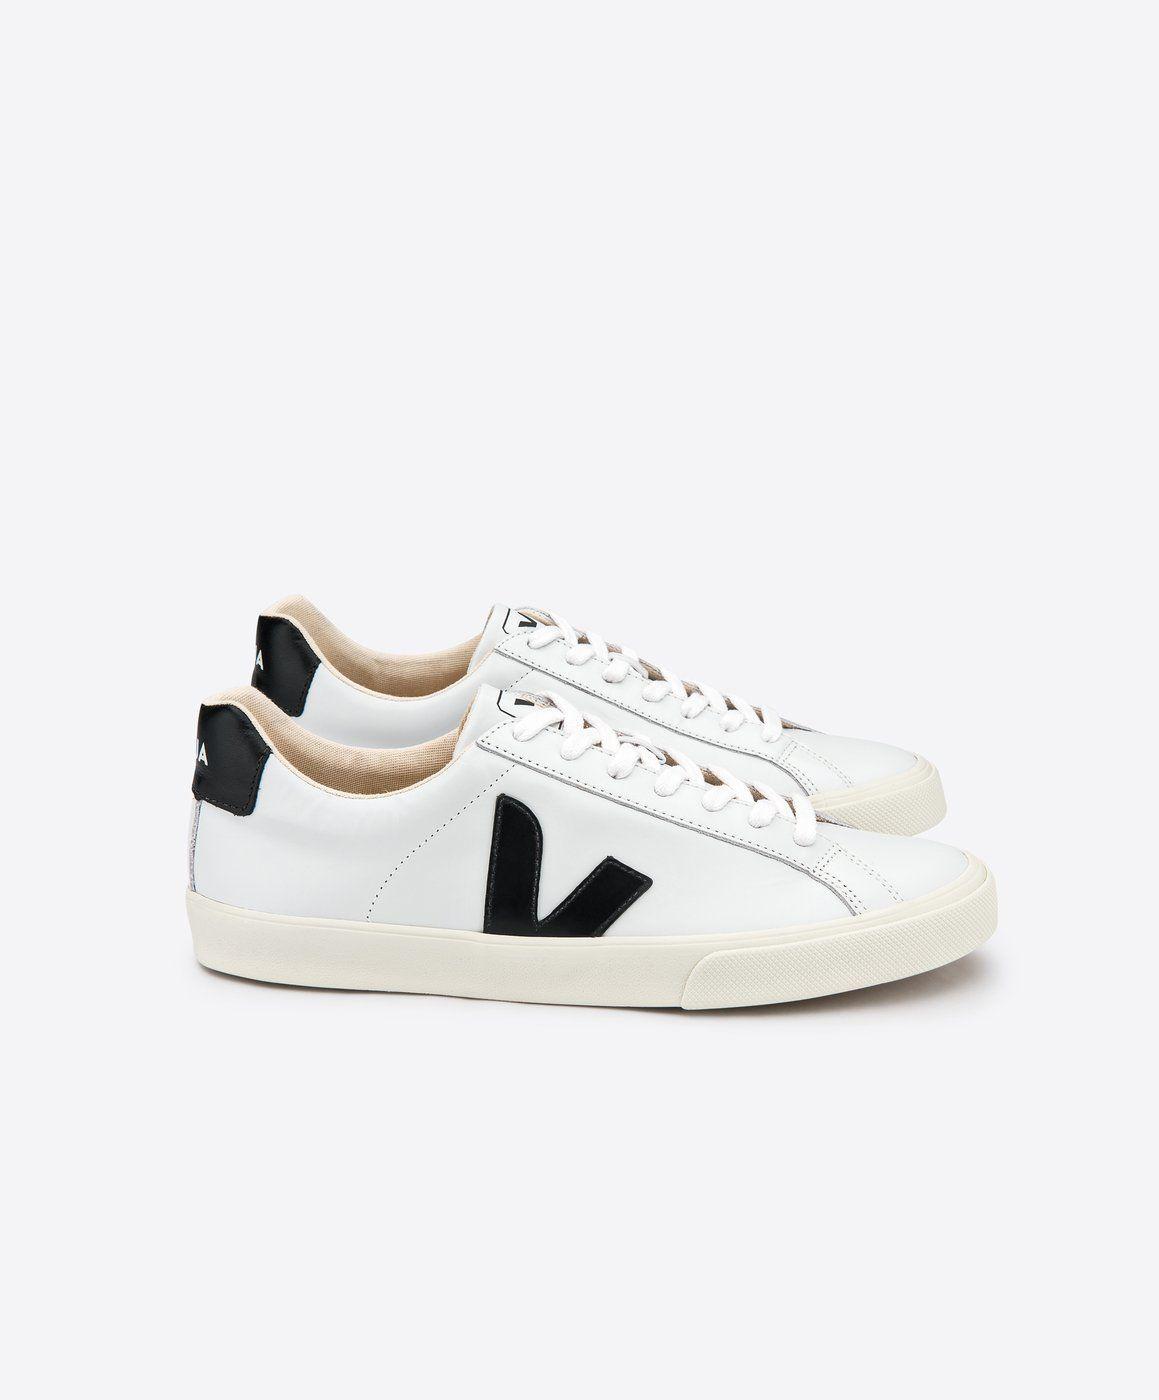 0383017cc4efb Veja Esplar Leather Shoe - White Black   8 in 2019